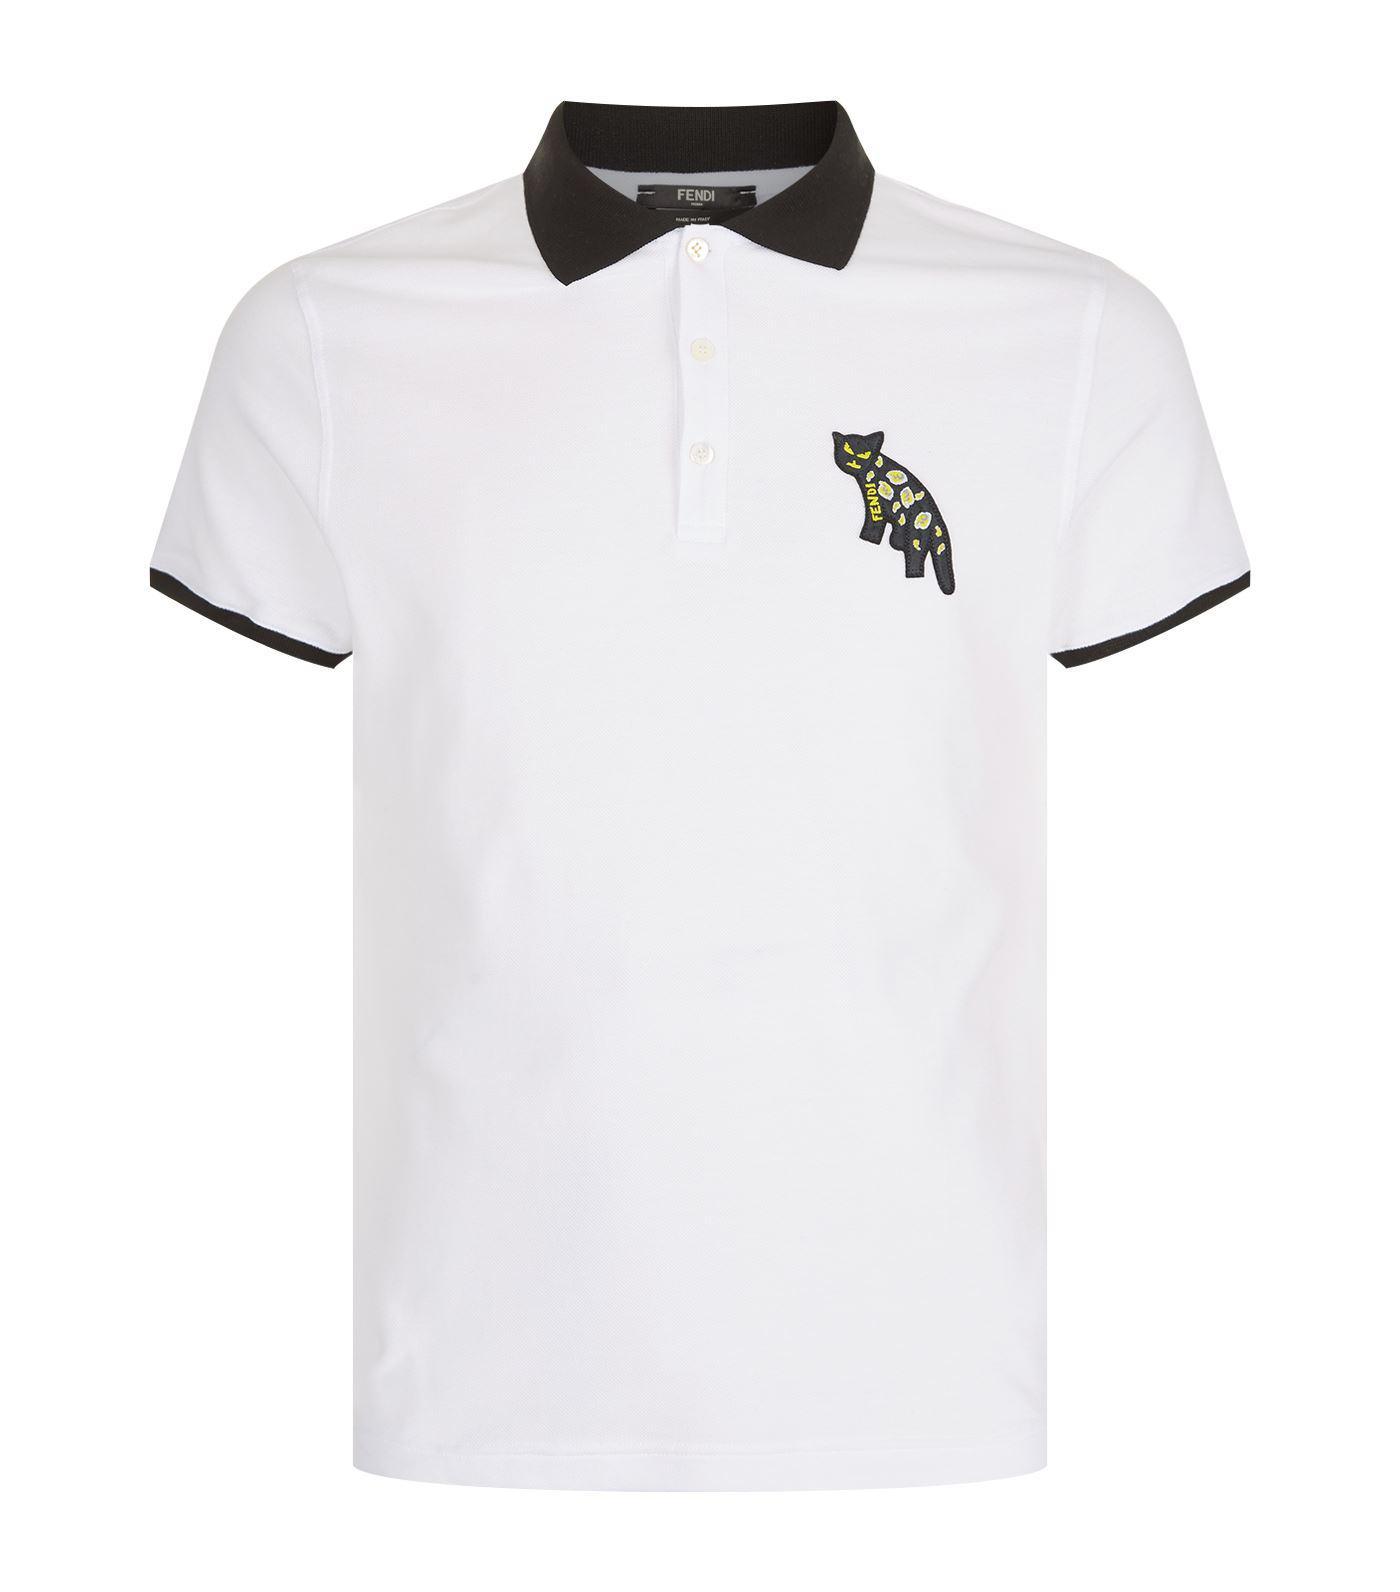 high t products shirt up shop online and jaguar shirts quality details product cotton white